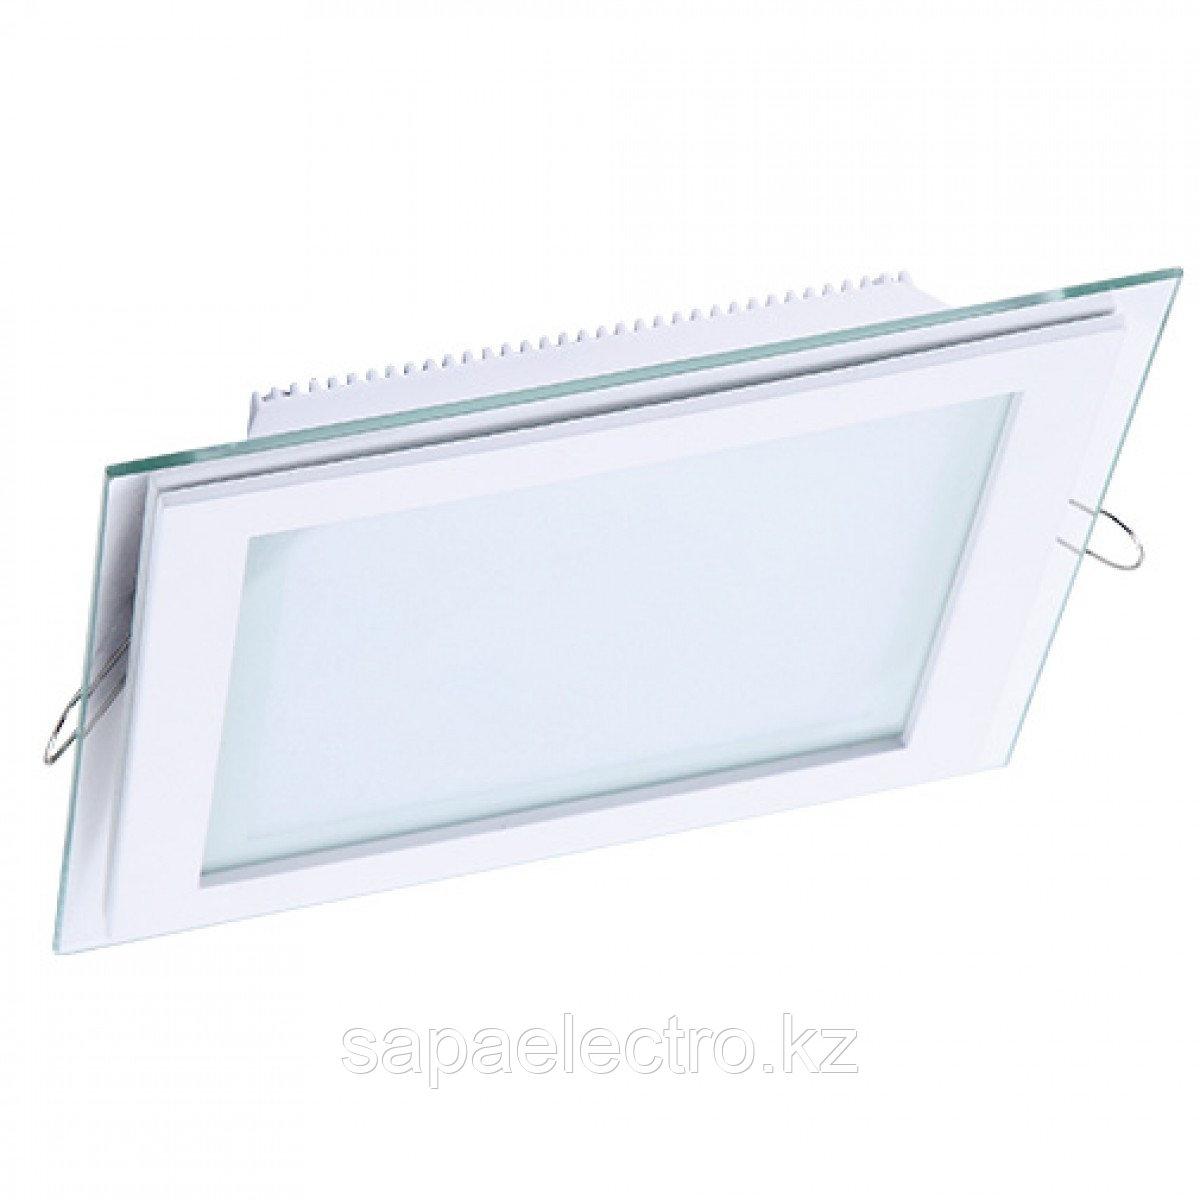 Свет-к DL LED GLASS KVADRO PANEL18W 6000K (TS)20шт,